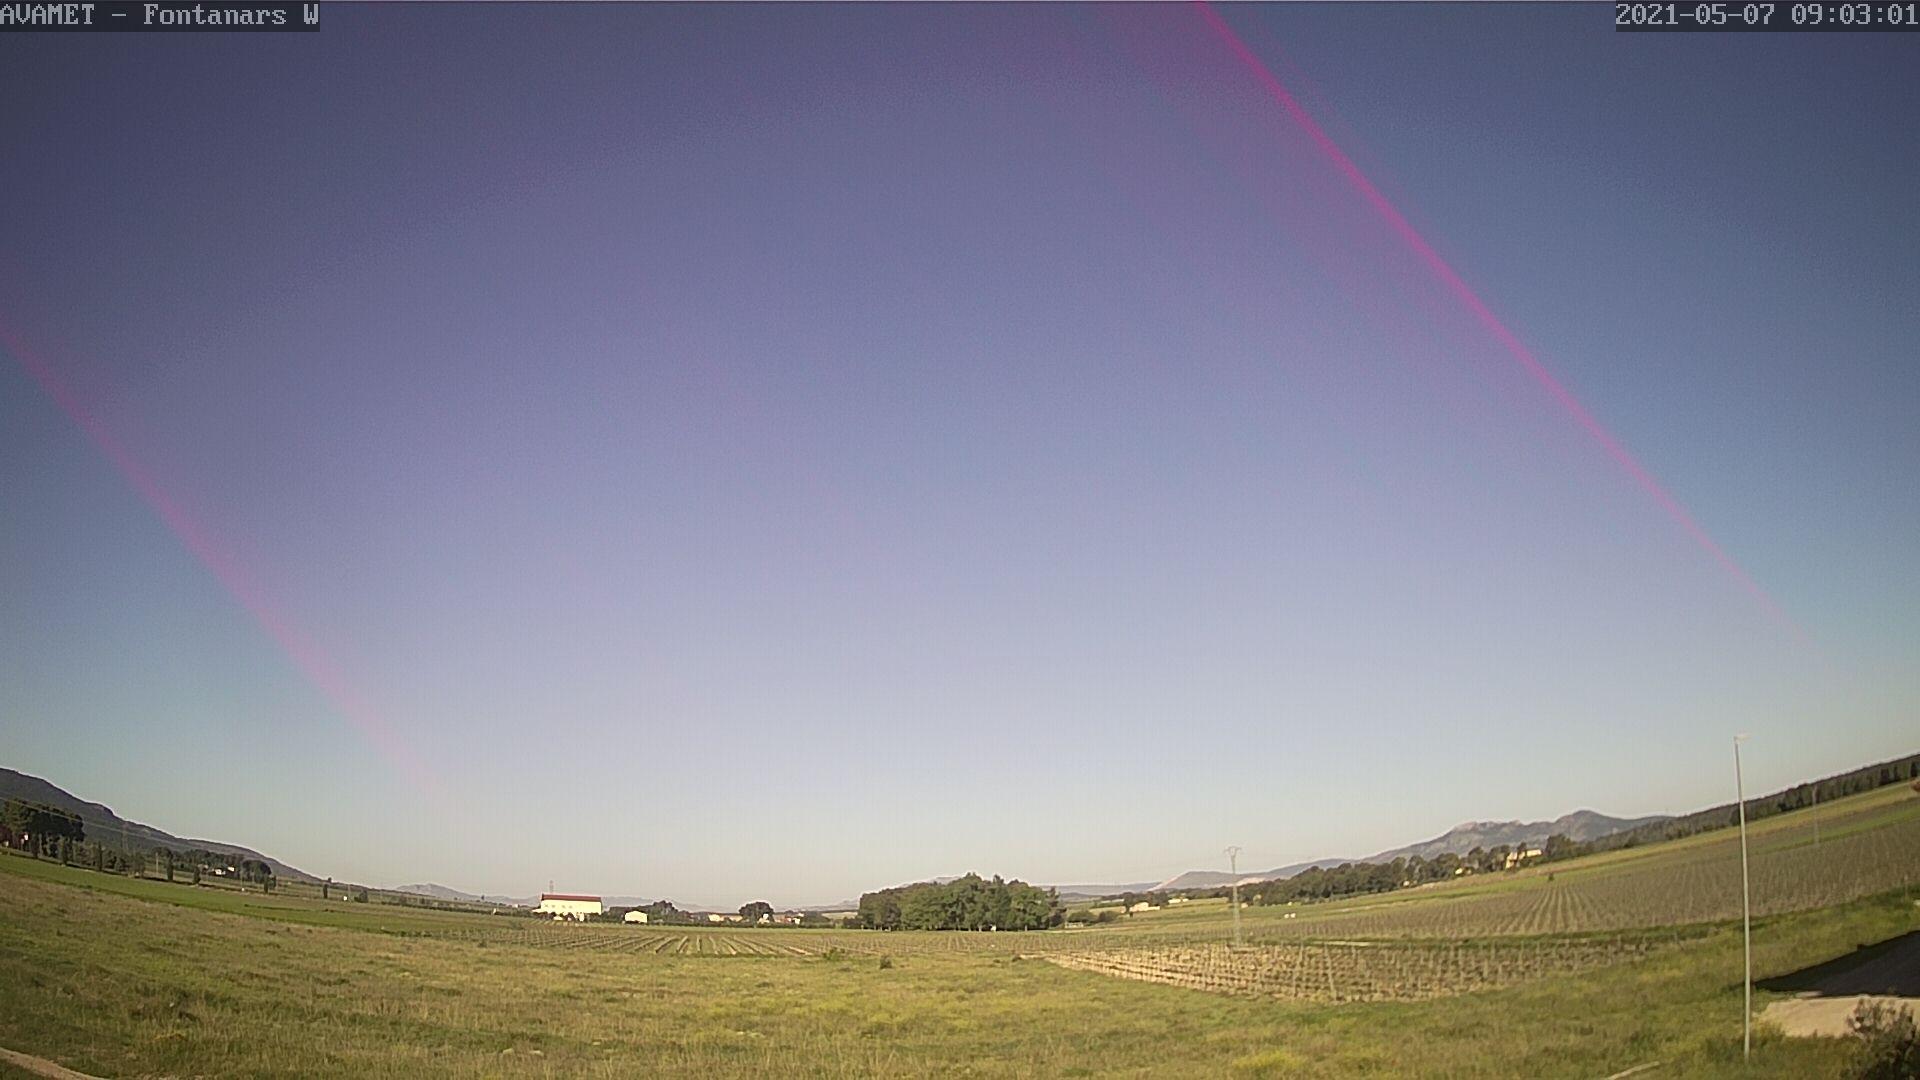 time-lapse frame, Fontanars AVAMET webcam